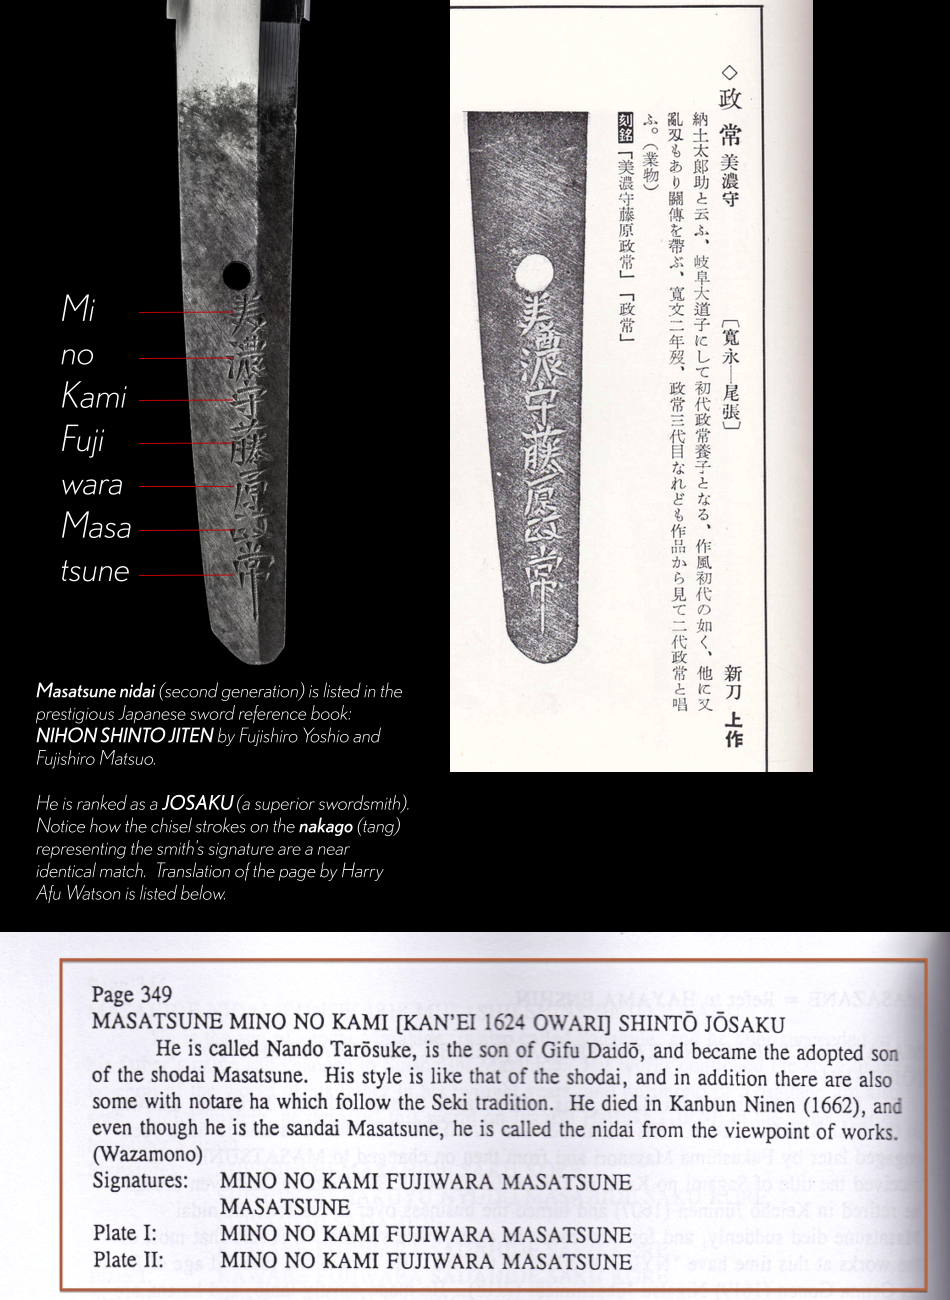 Masatsune Nidai Nakago Signature and Listing in Fujishiro Nihon Shinto Jiten